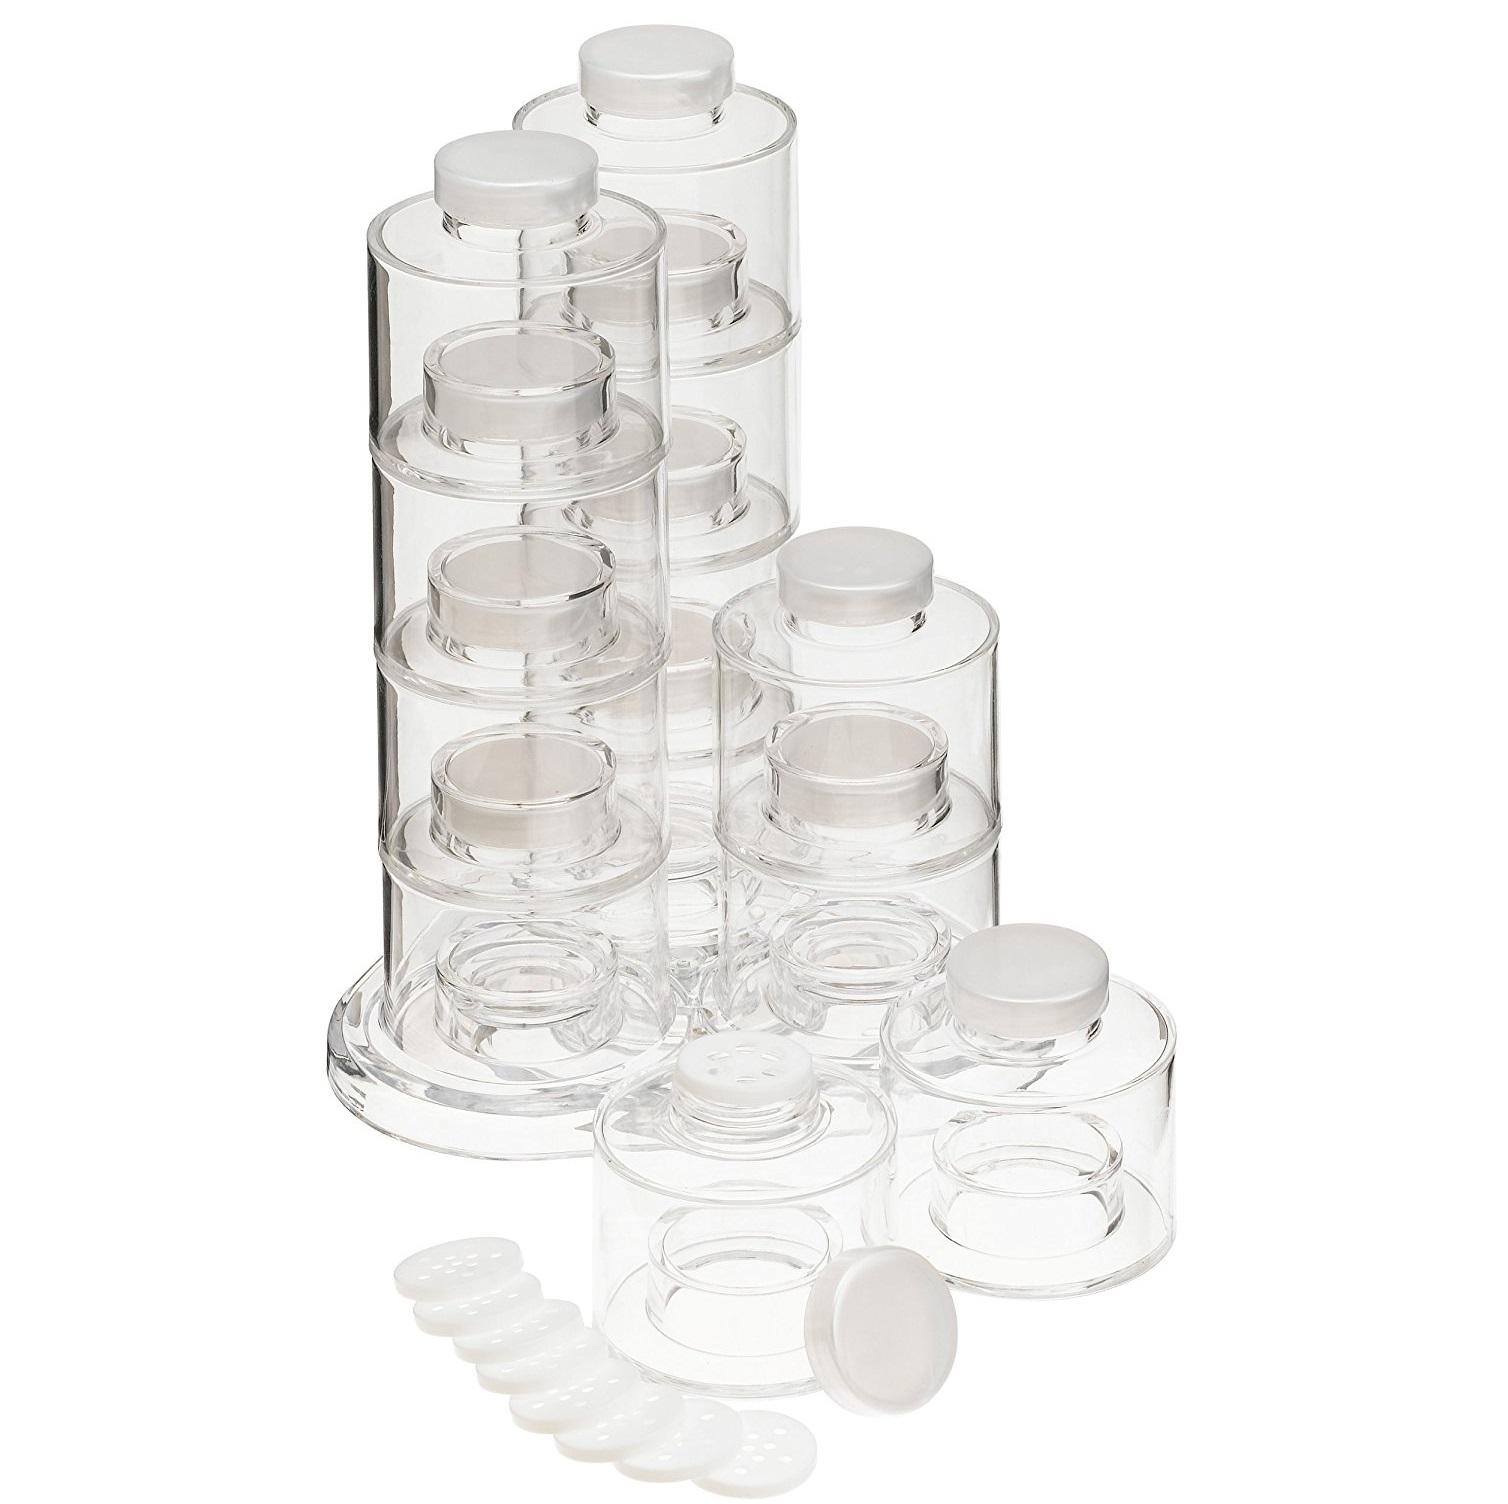 Уникален комплект солници Spice Tower за всичките ви подправки  - 12 броя